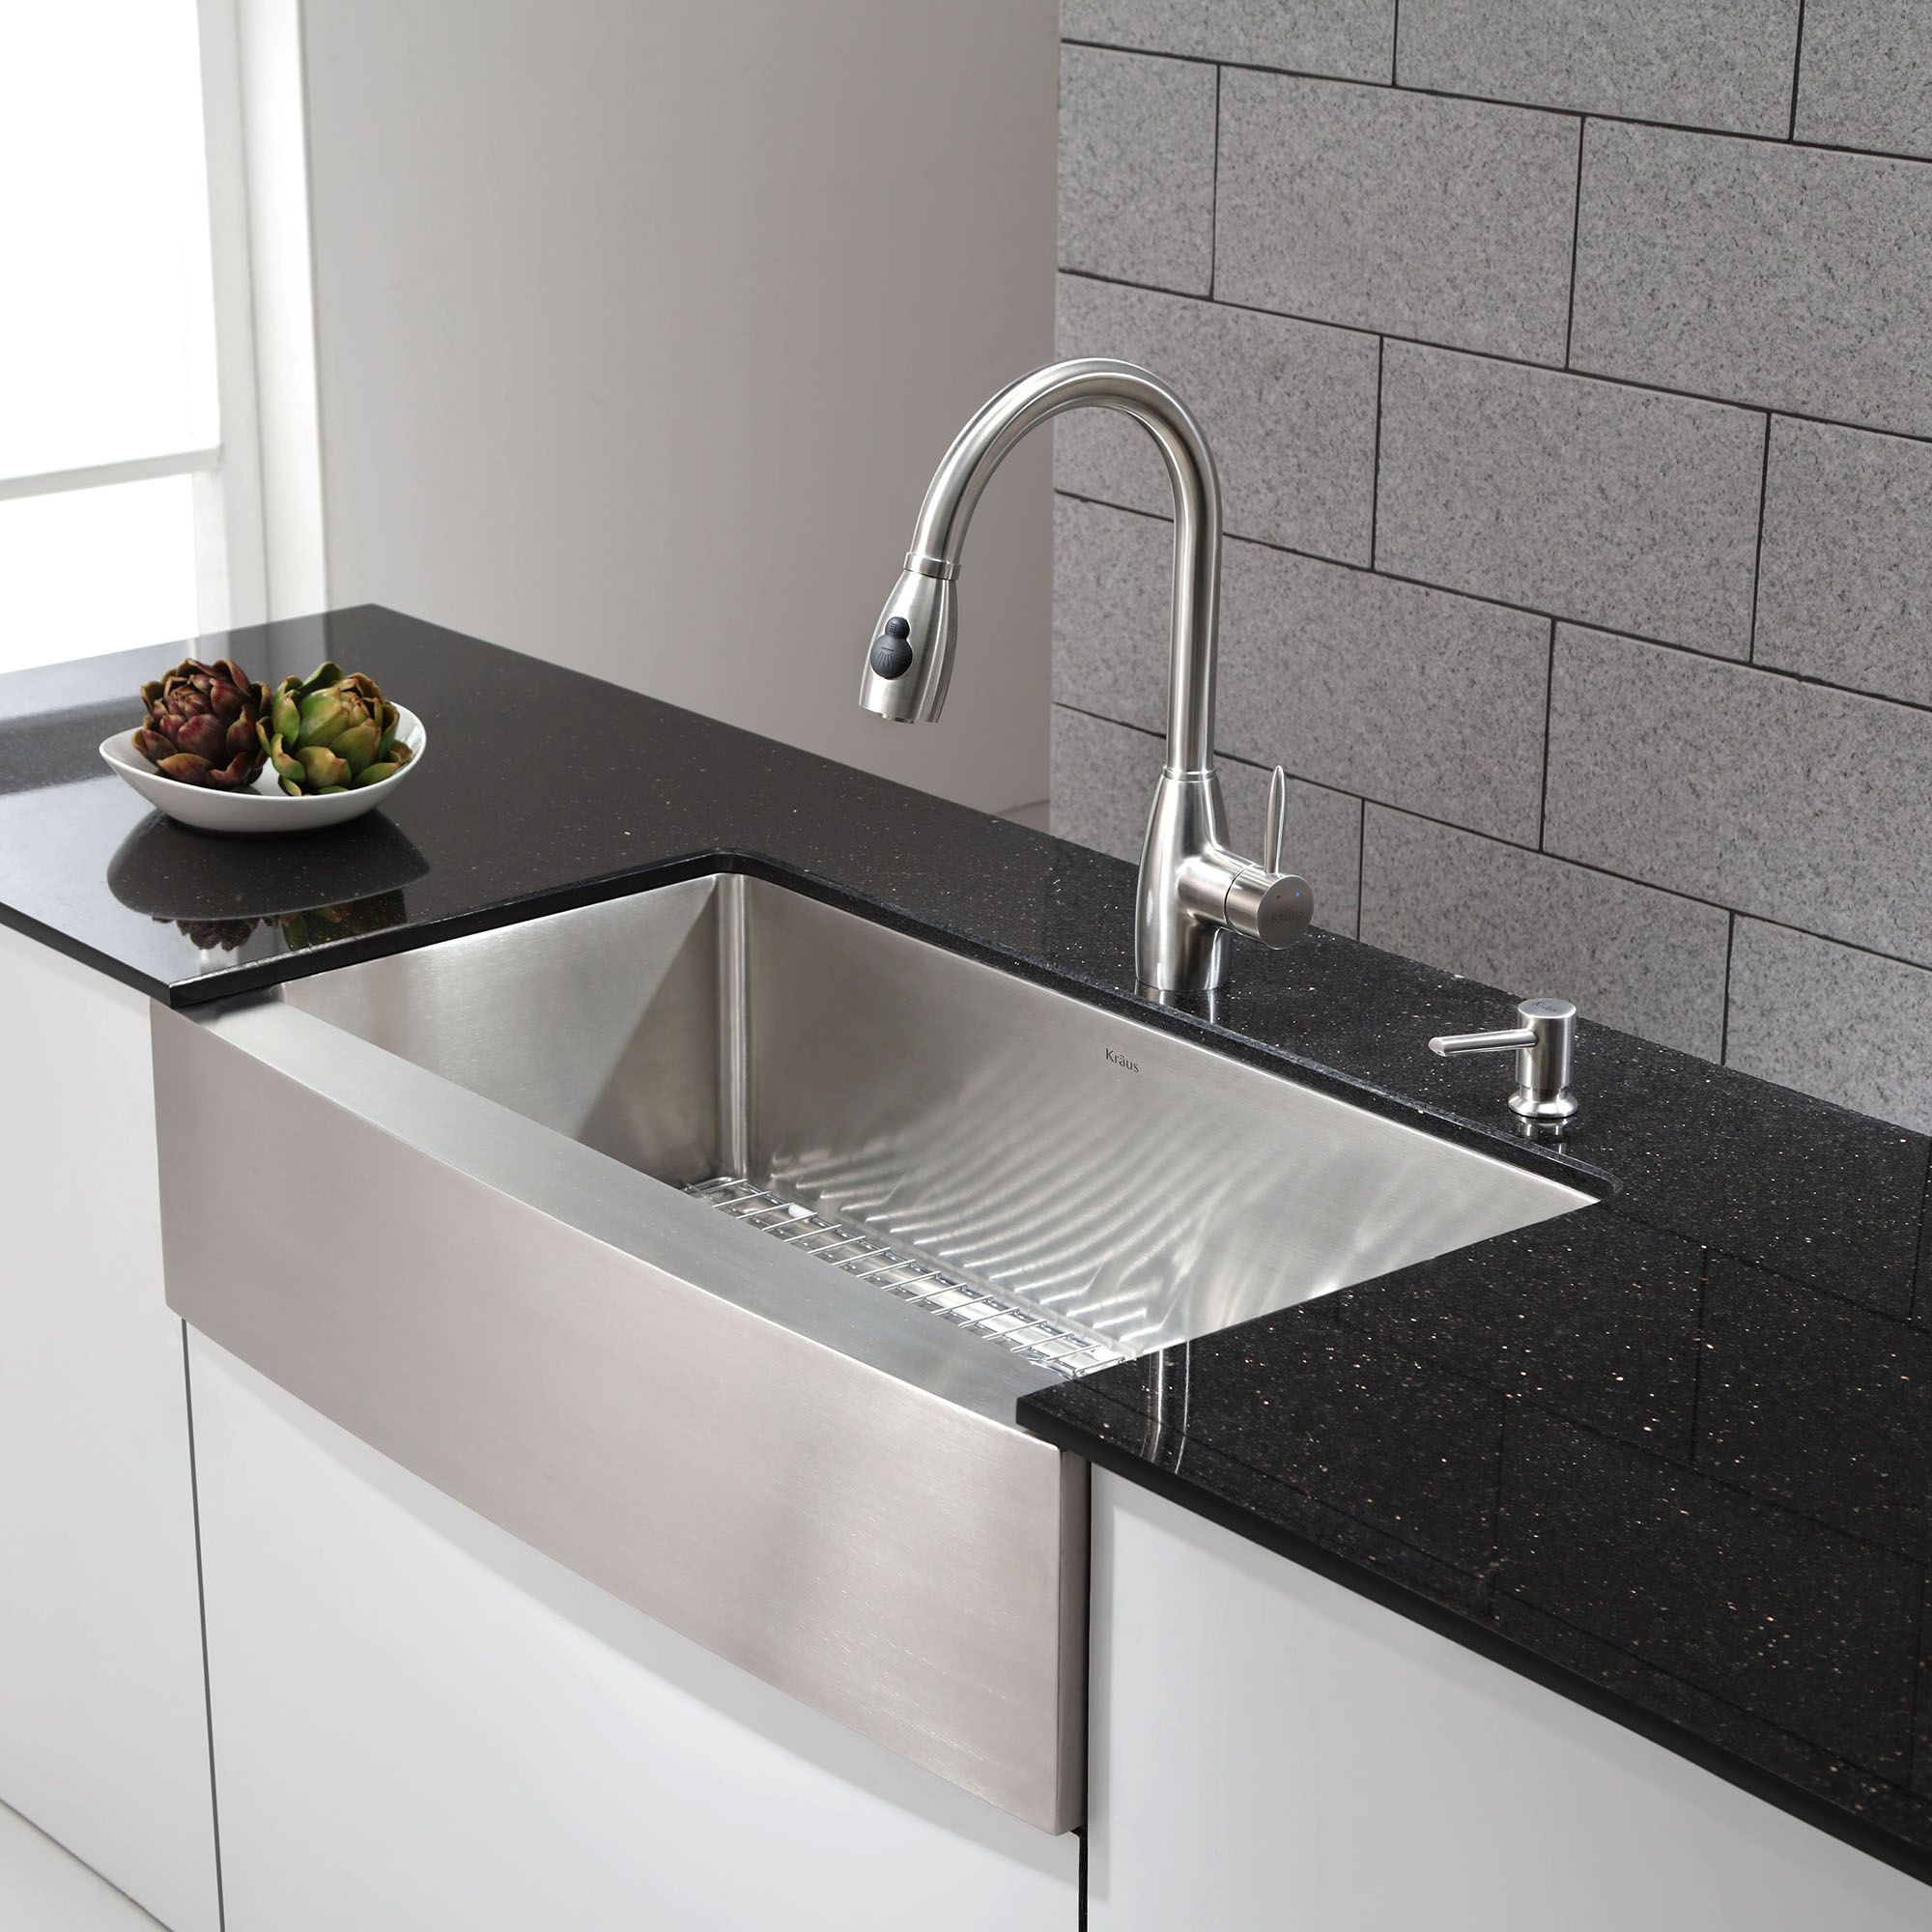 Stainless Steel Undermount Bathroom Sink | Undermount Stainless Steel Sinks  | Drop in Farmhouse Sink